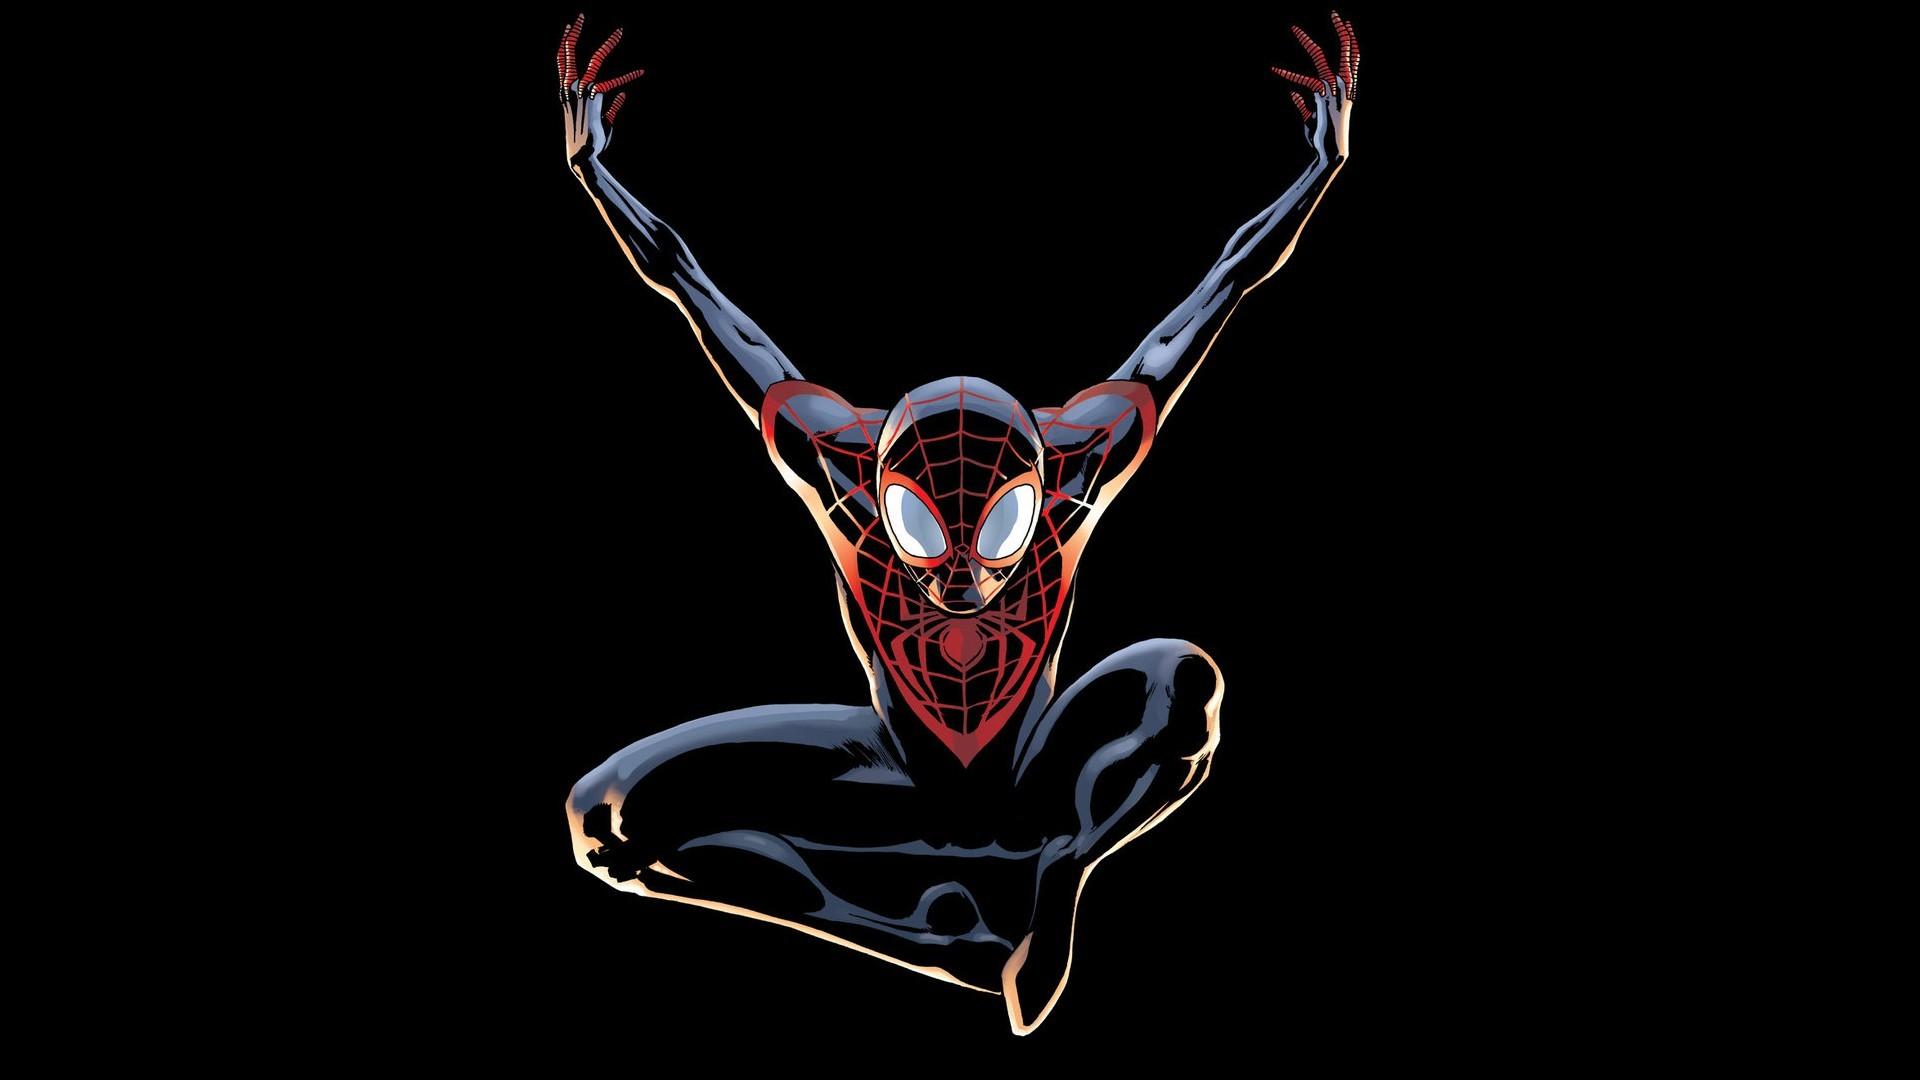 Comics – Ultimate Spider-Man Wallpaper